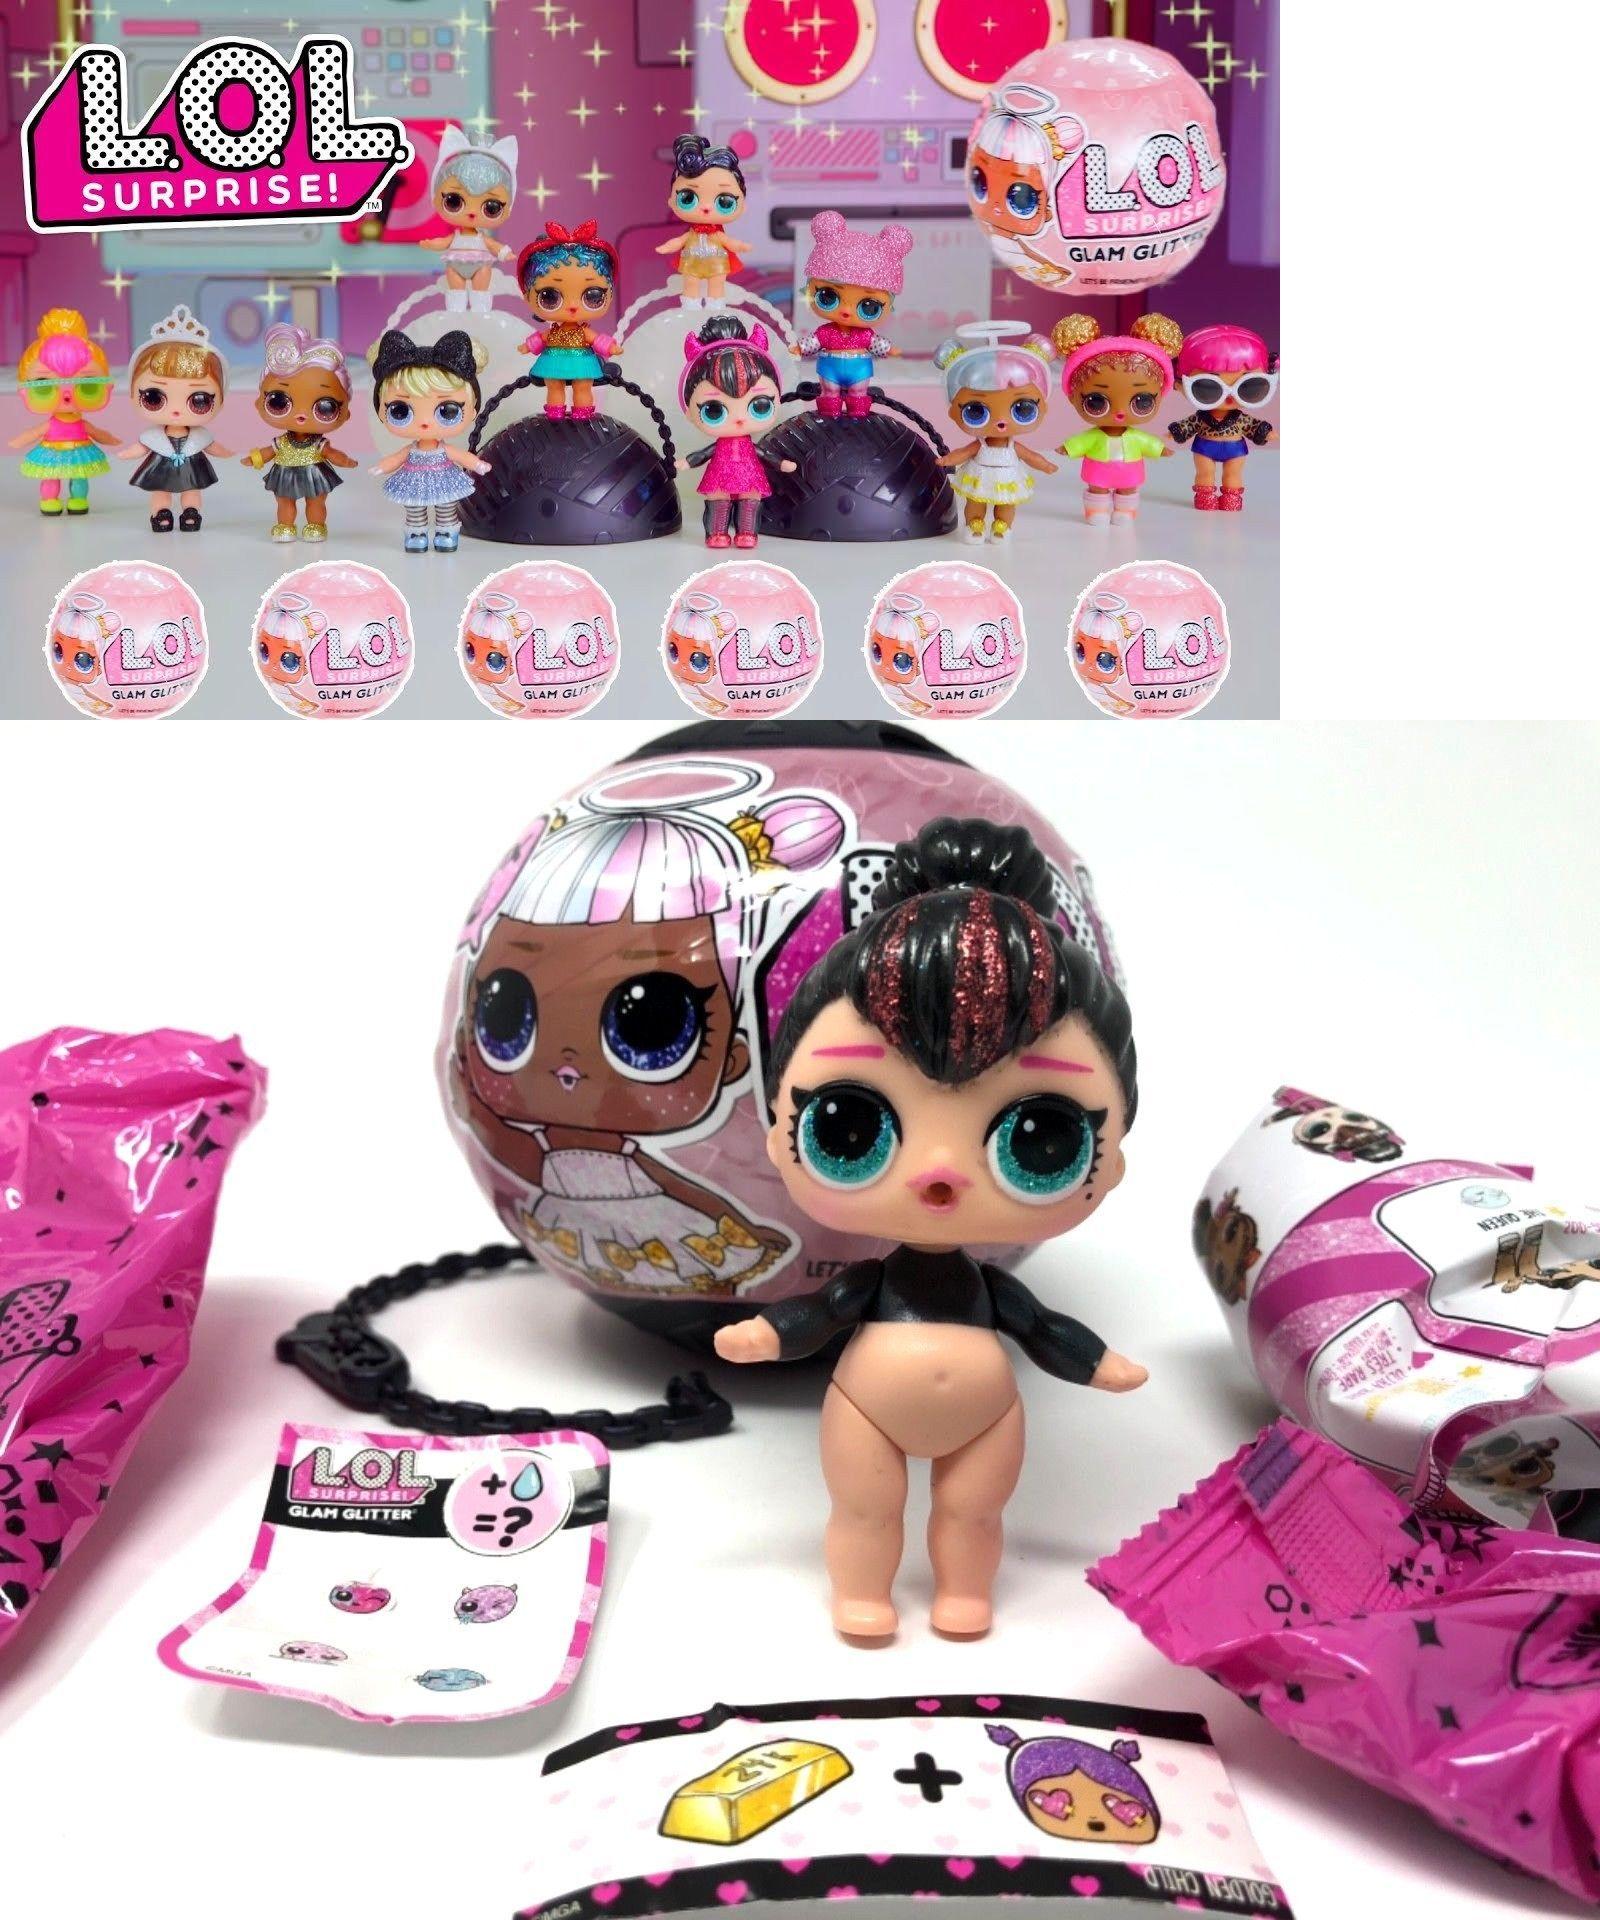 Authentic ✨ ✨ Brand New Lot of 3 LOL Surprise Dolls Balls GLITTER SERIES L.O.L